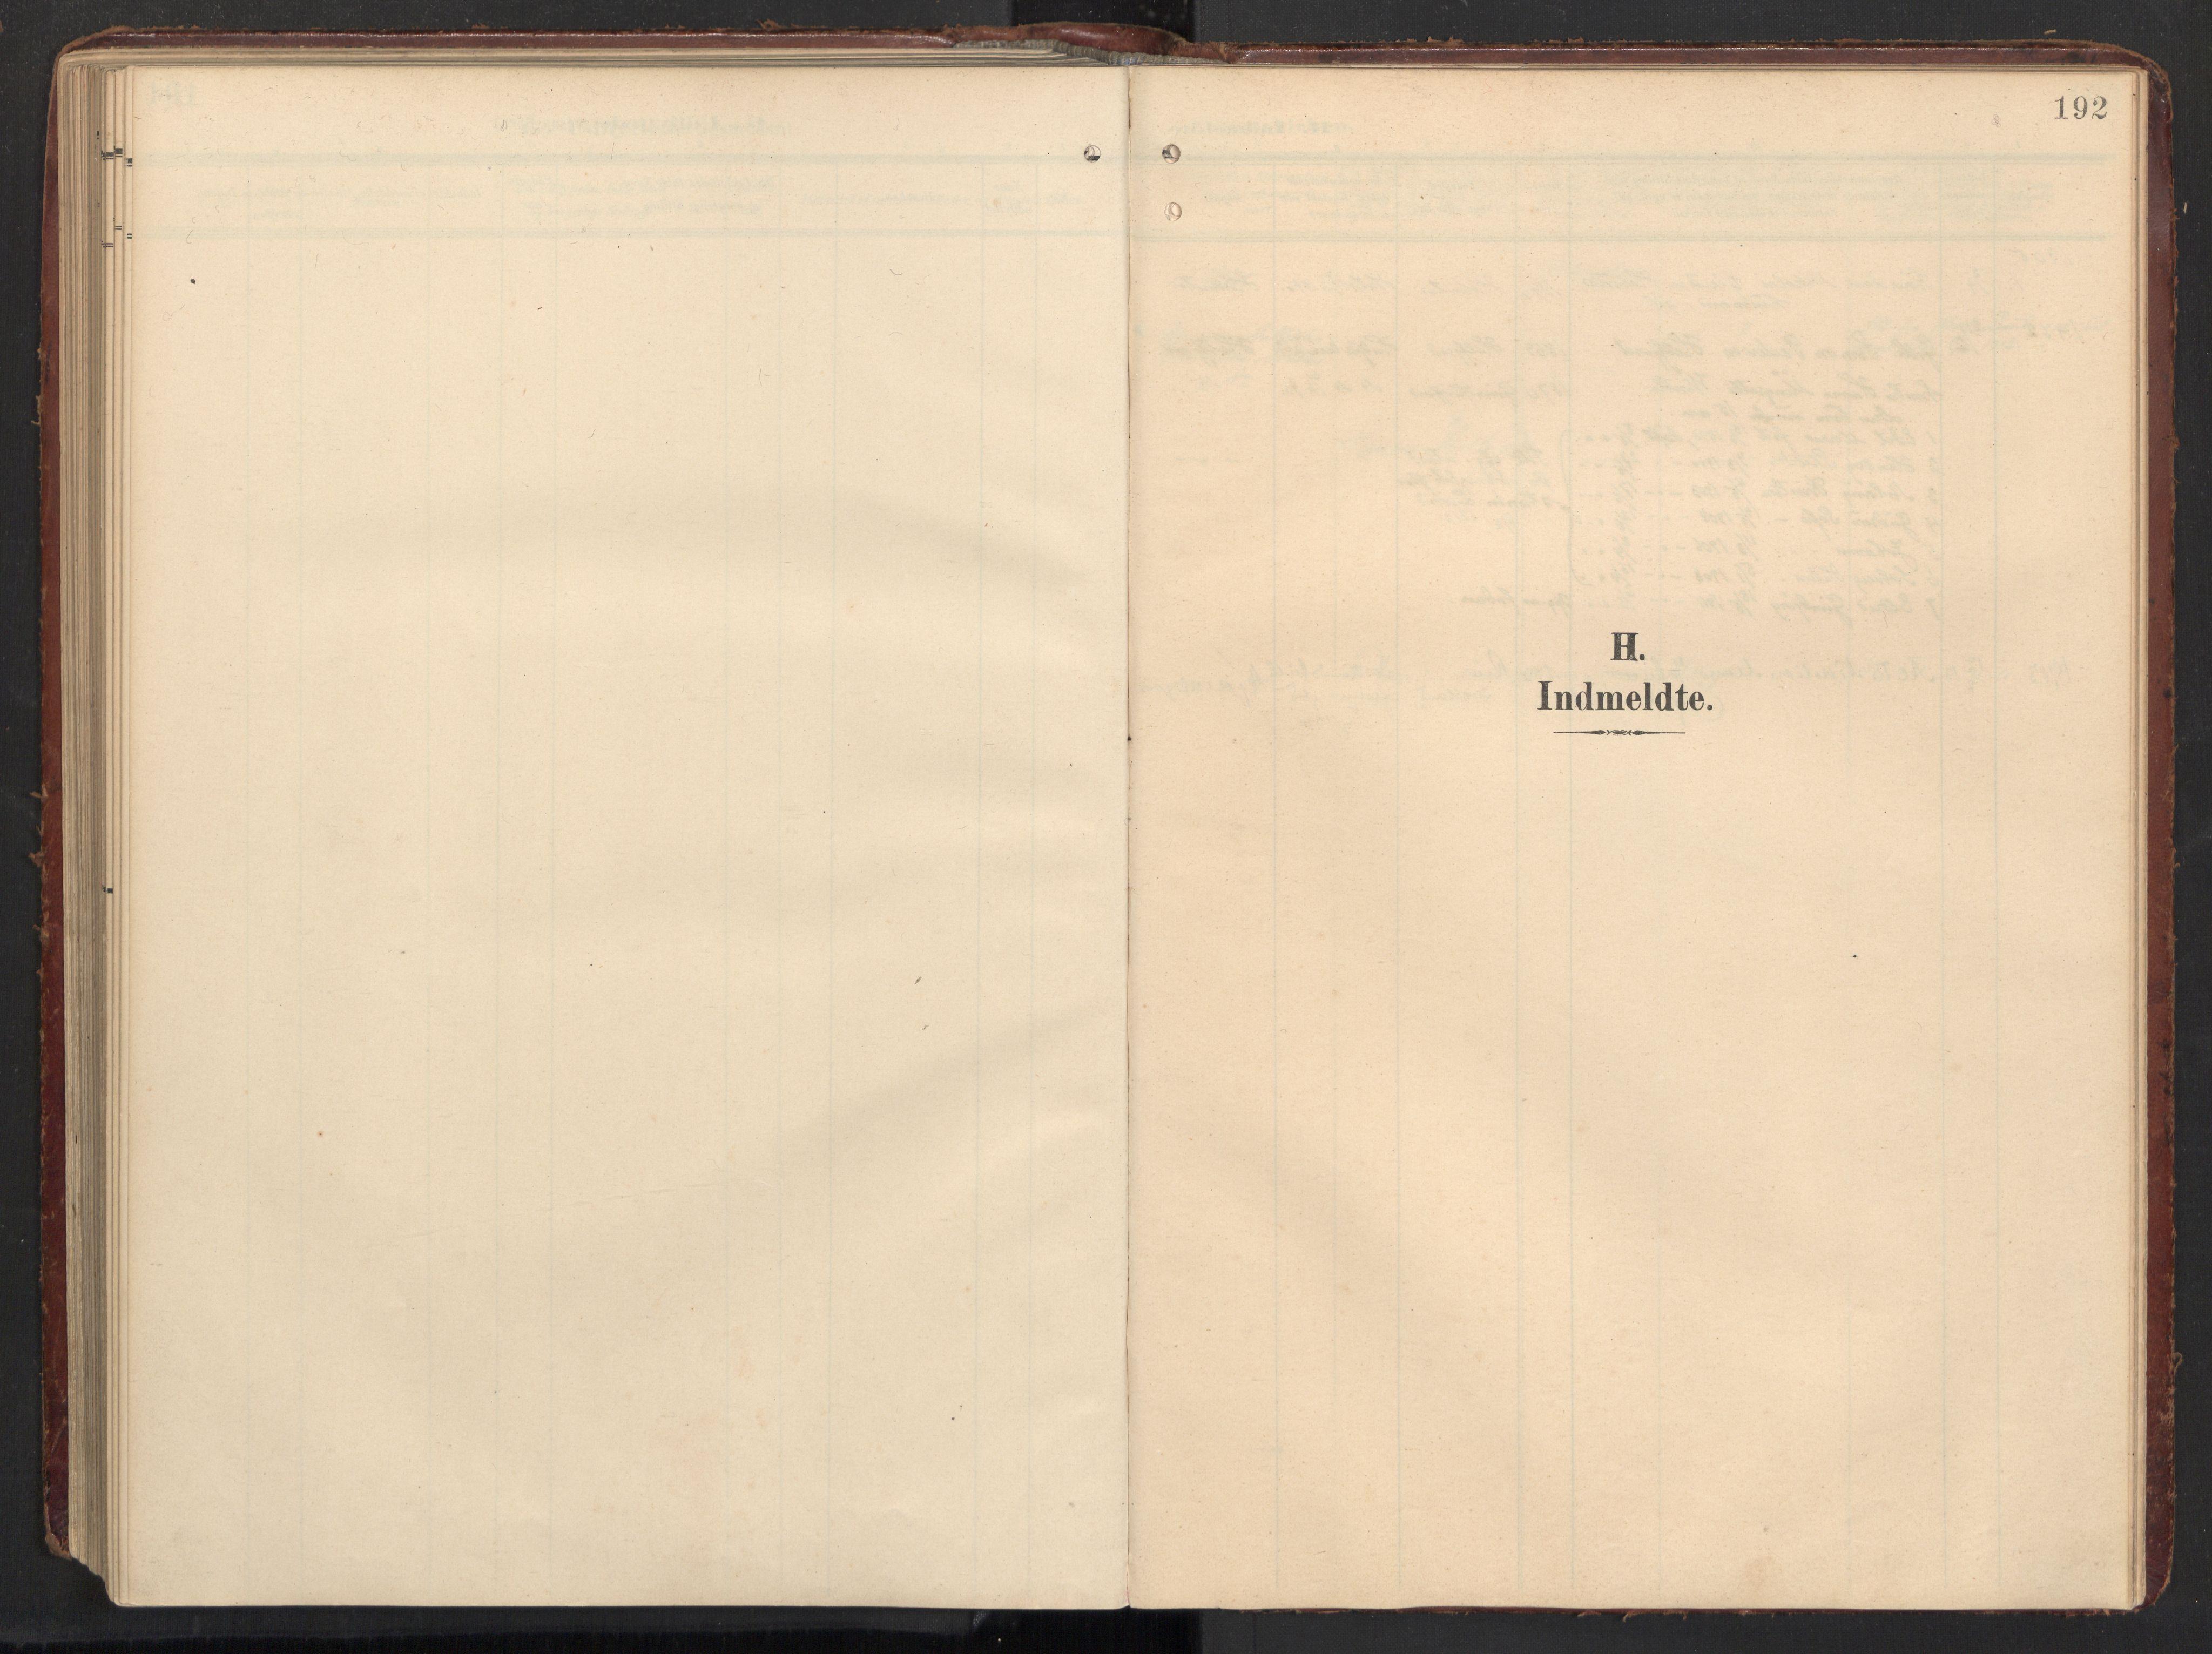 SAT, Ministerialprotokoller, klokkerbøker og fødselsregistre - Nordland, 890/L1287: Ministerialbok nr. 890A02, 1903-1915, s. 192